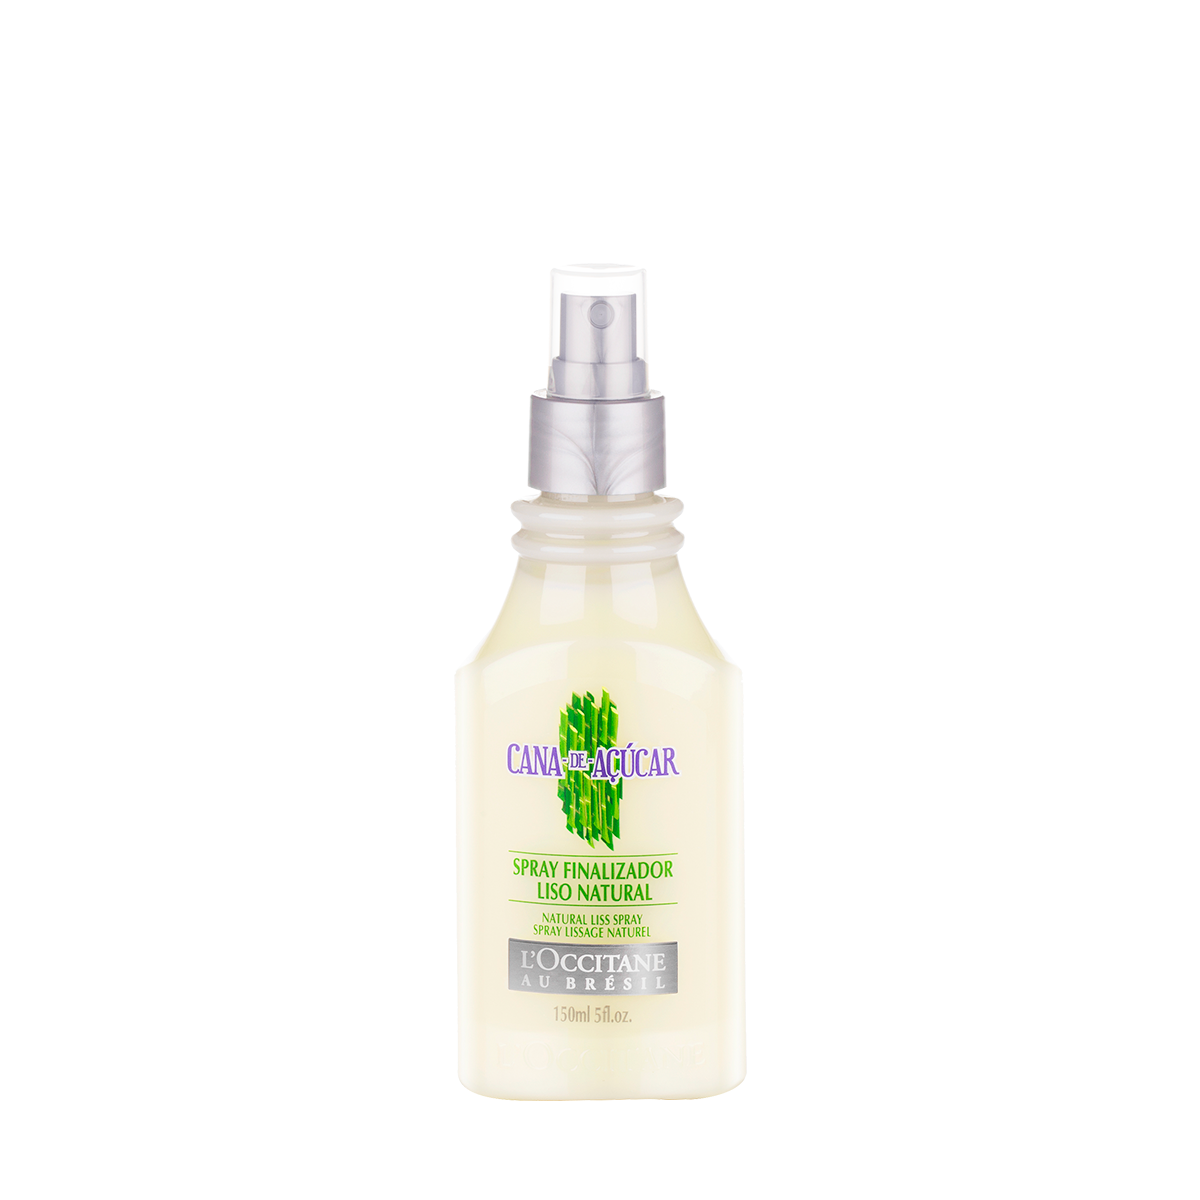 Spray Finalizador Liso Natural Cana-De-Açúcar